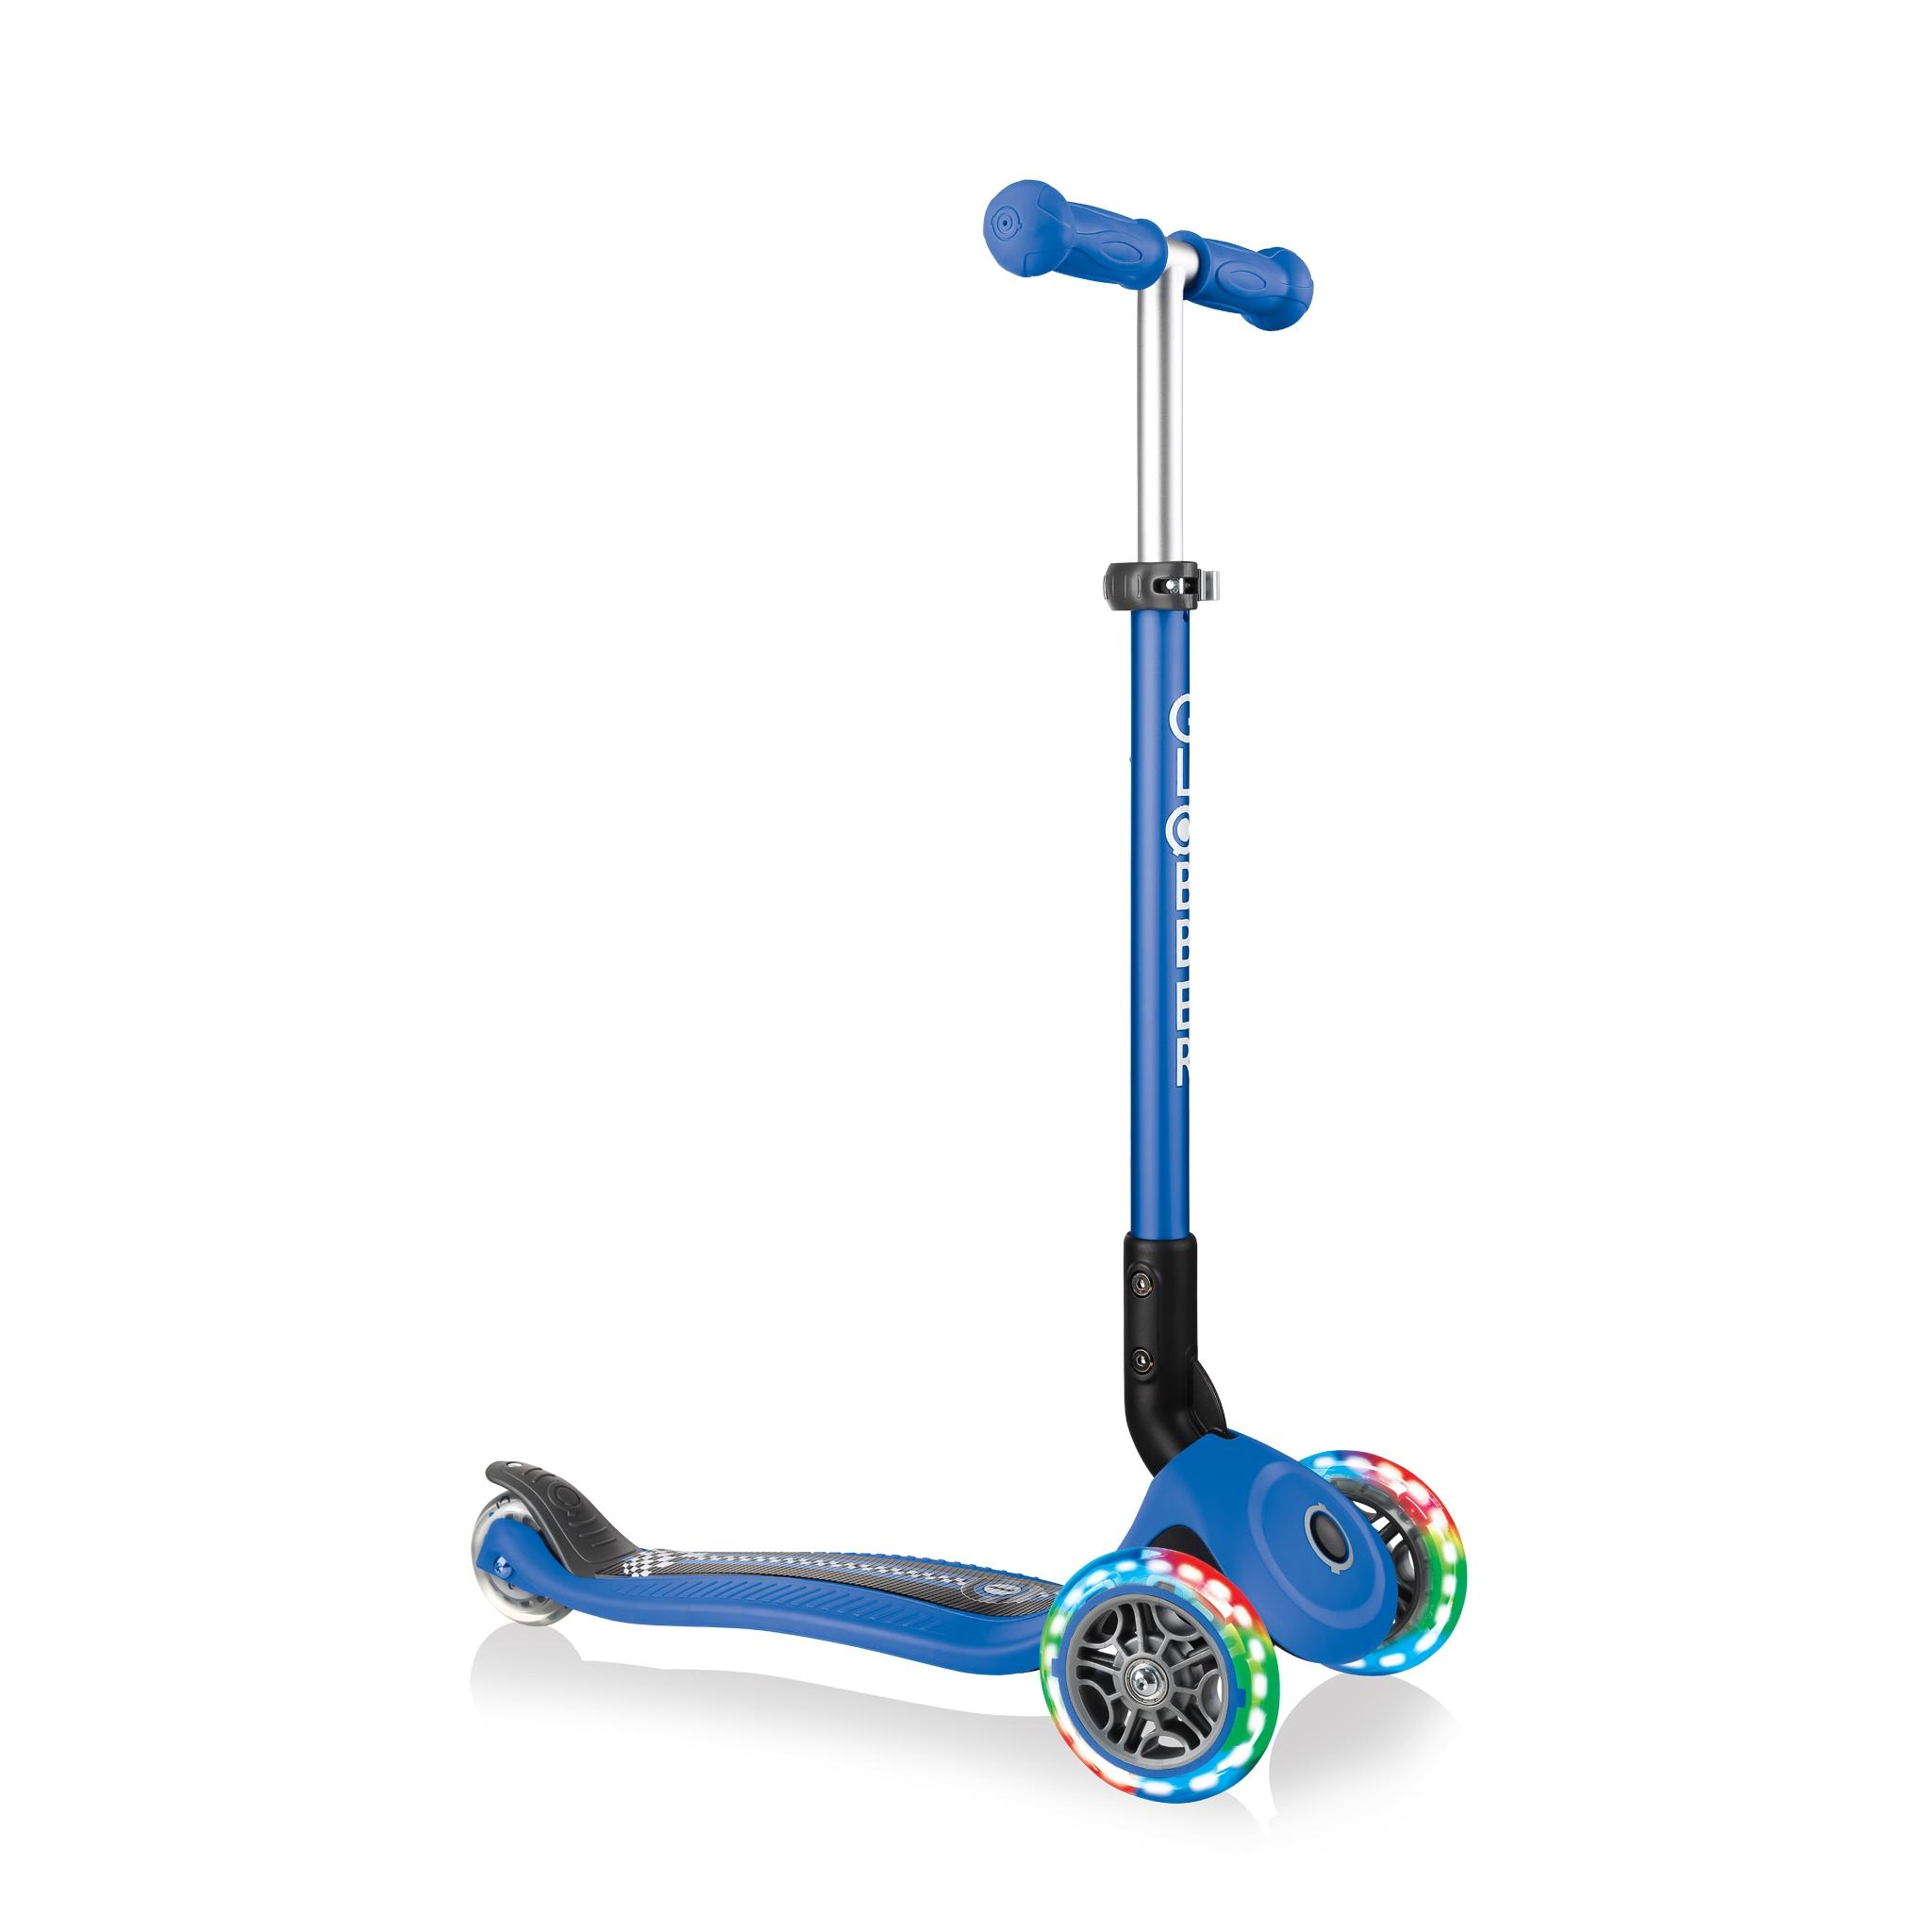 primo-foldable-fantasy-lights-3-wheel-scooter-for-kids 0